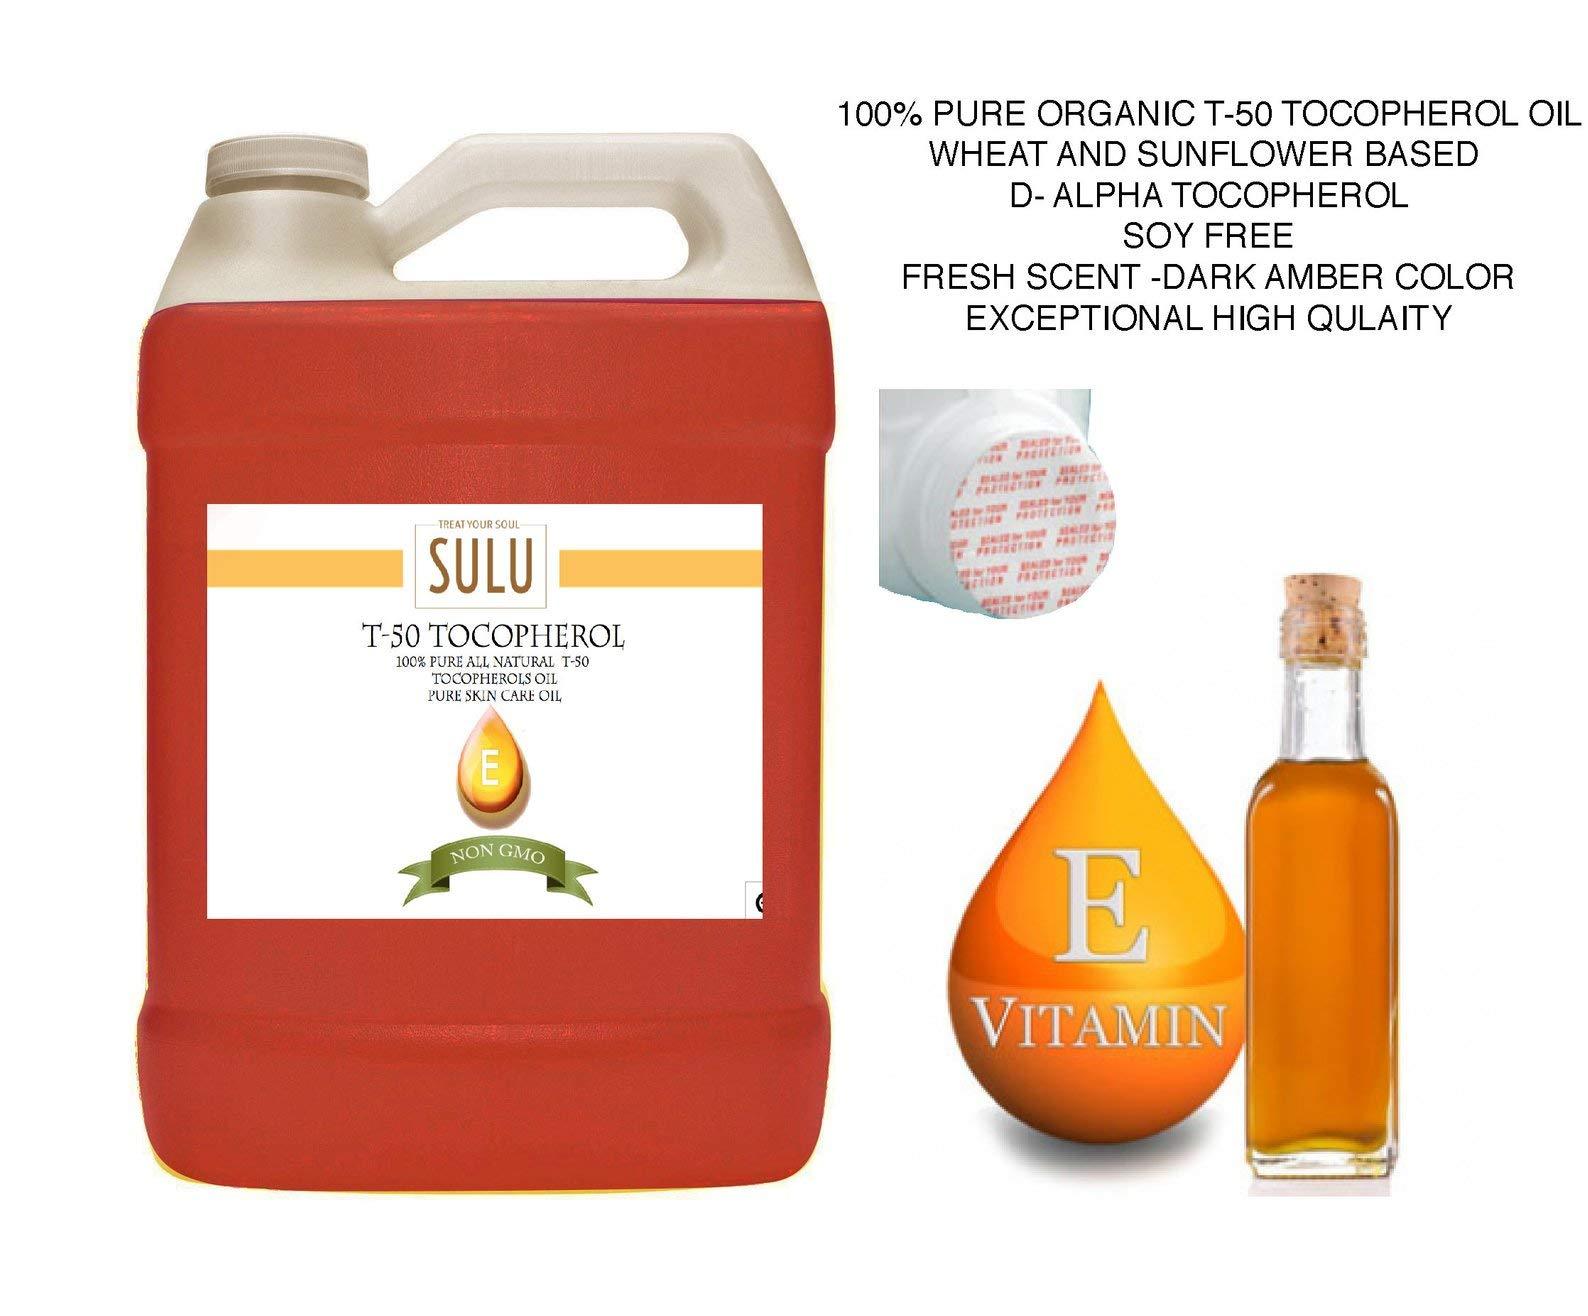 100% Pure Organic T-50 Tocopherol Vitamin E Oil (7 lbs)